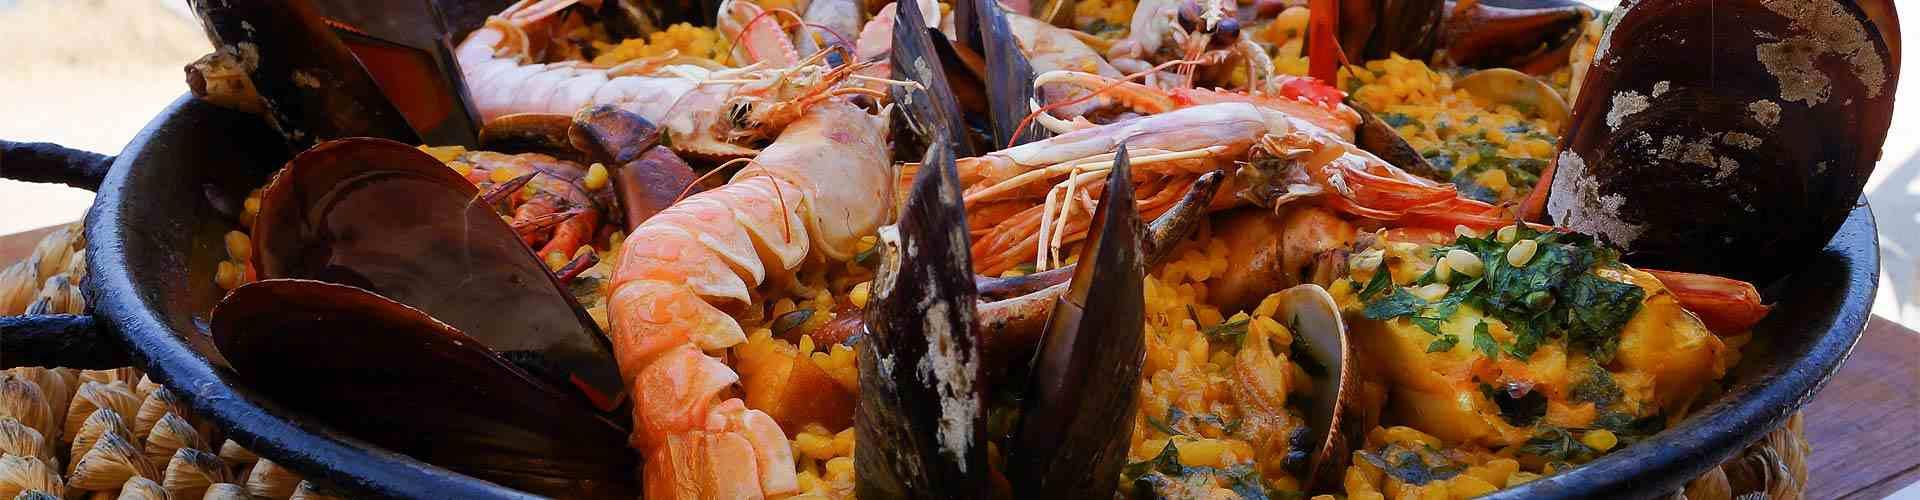 restaurante paellas en restaurantes de Agullent